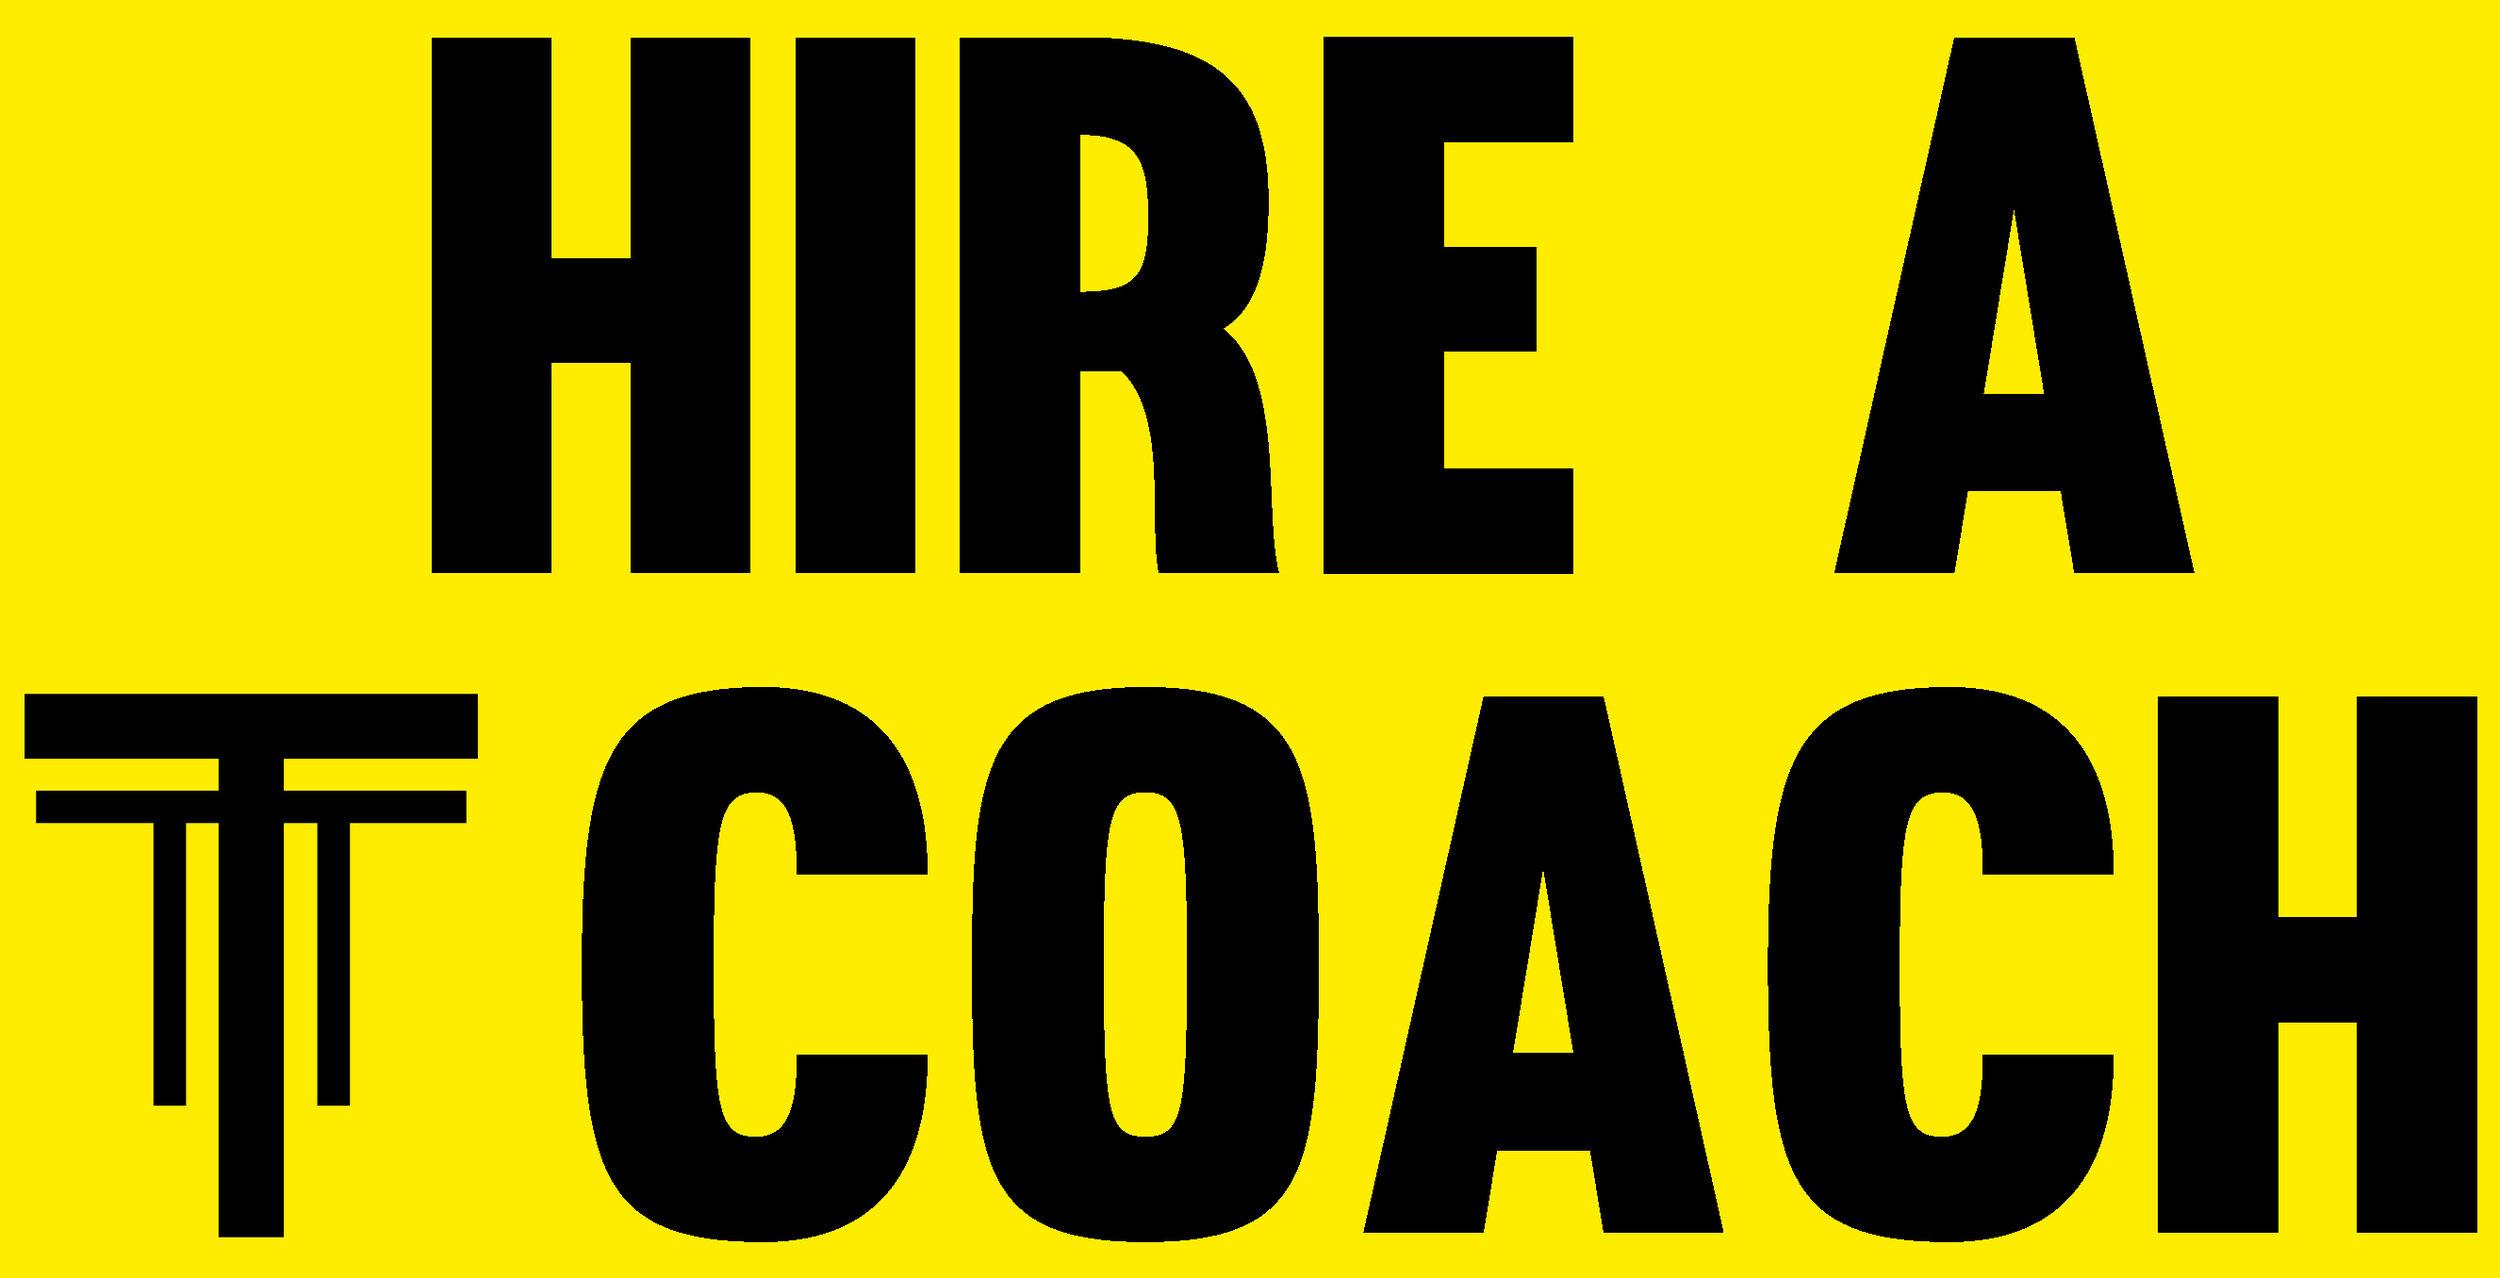 hire cmyk.jpg